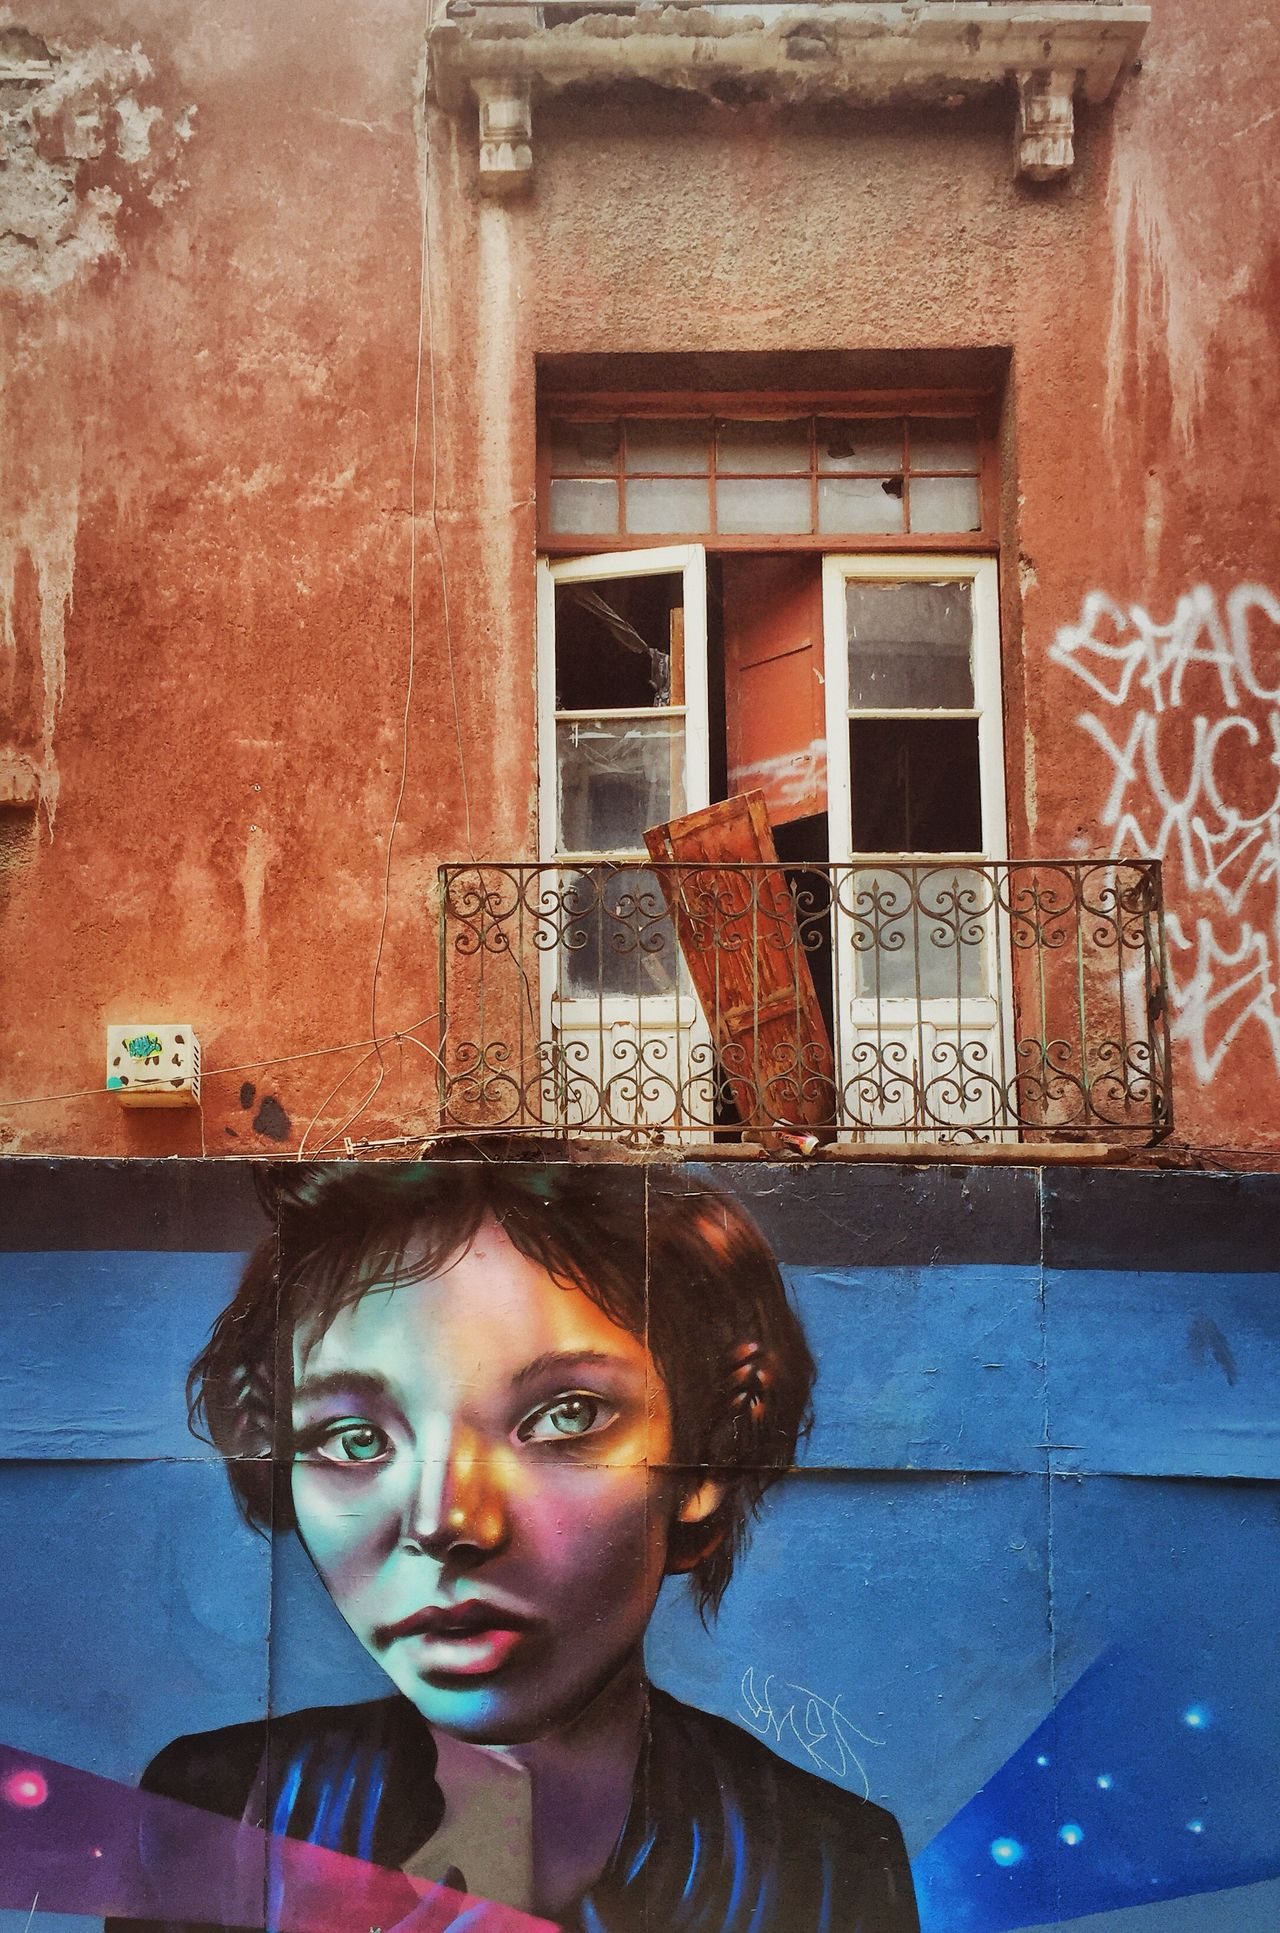 Esos ojazos!!! Thateyes Streetphotography Streetart Graffiti Window Arteurbano Mexicocity  Corredor Regina Cdmx Ventana Mexico Building Exterior Mural Miradas Beautiful Woman Fotografía Urbana